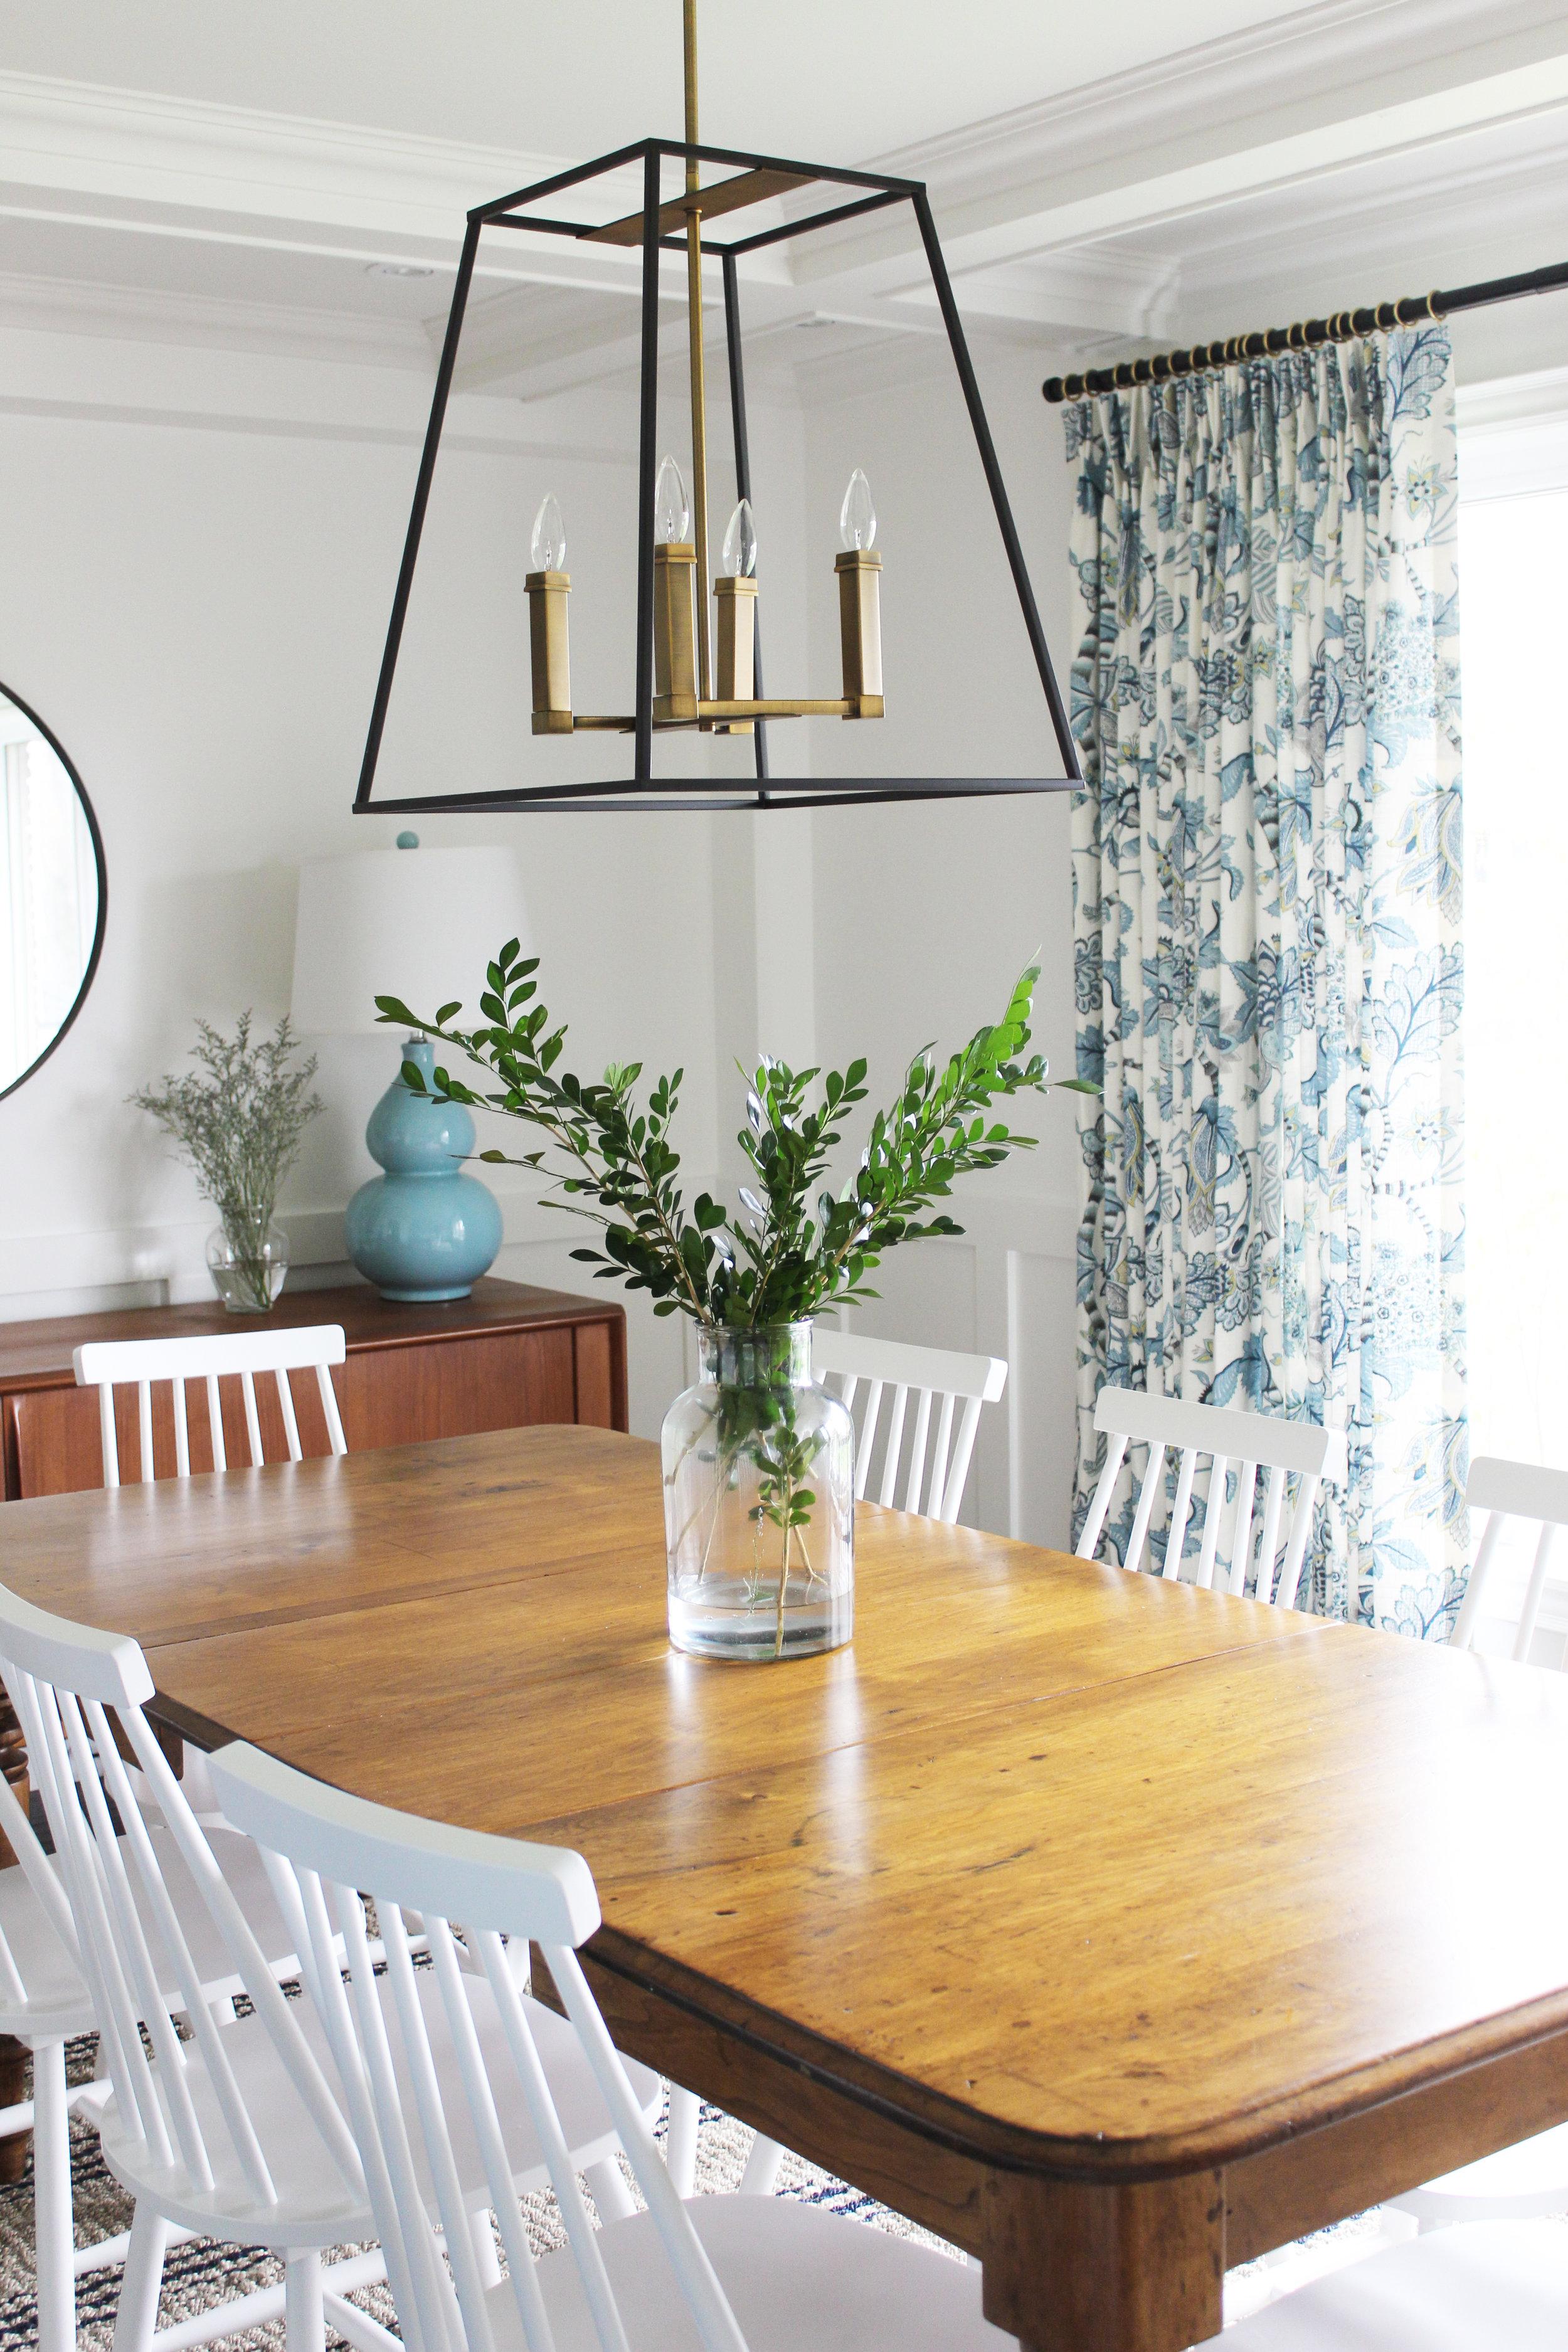 diningroommakeover_tiffanyleighdesign_7.jpg